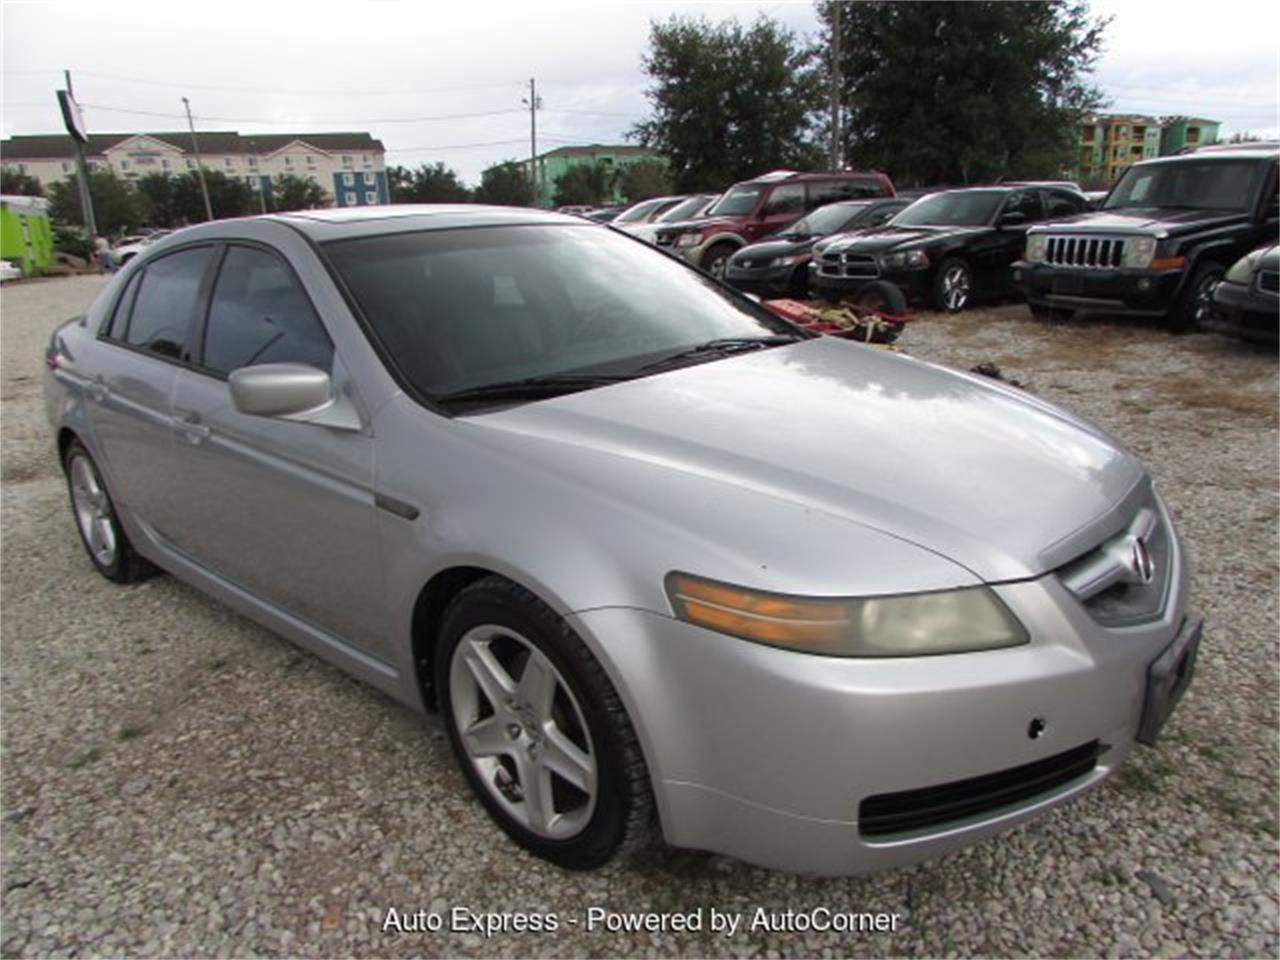 2006 Acura Tl For Sale Classiccars Com Cc 1163804